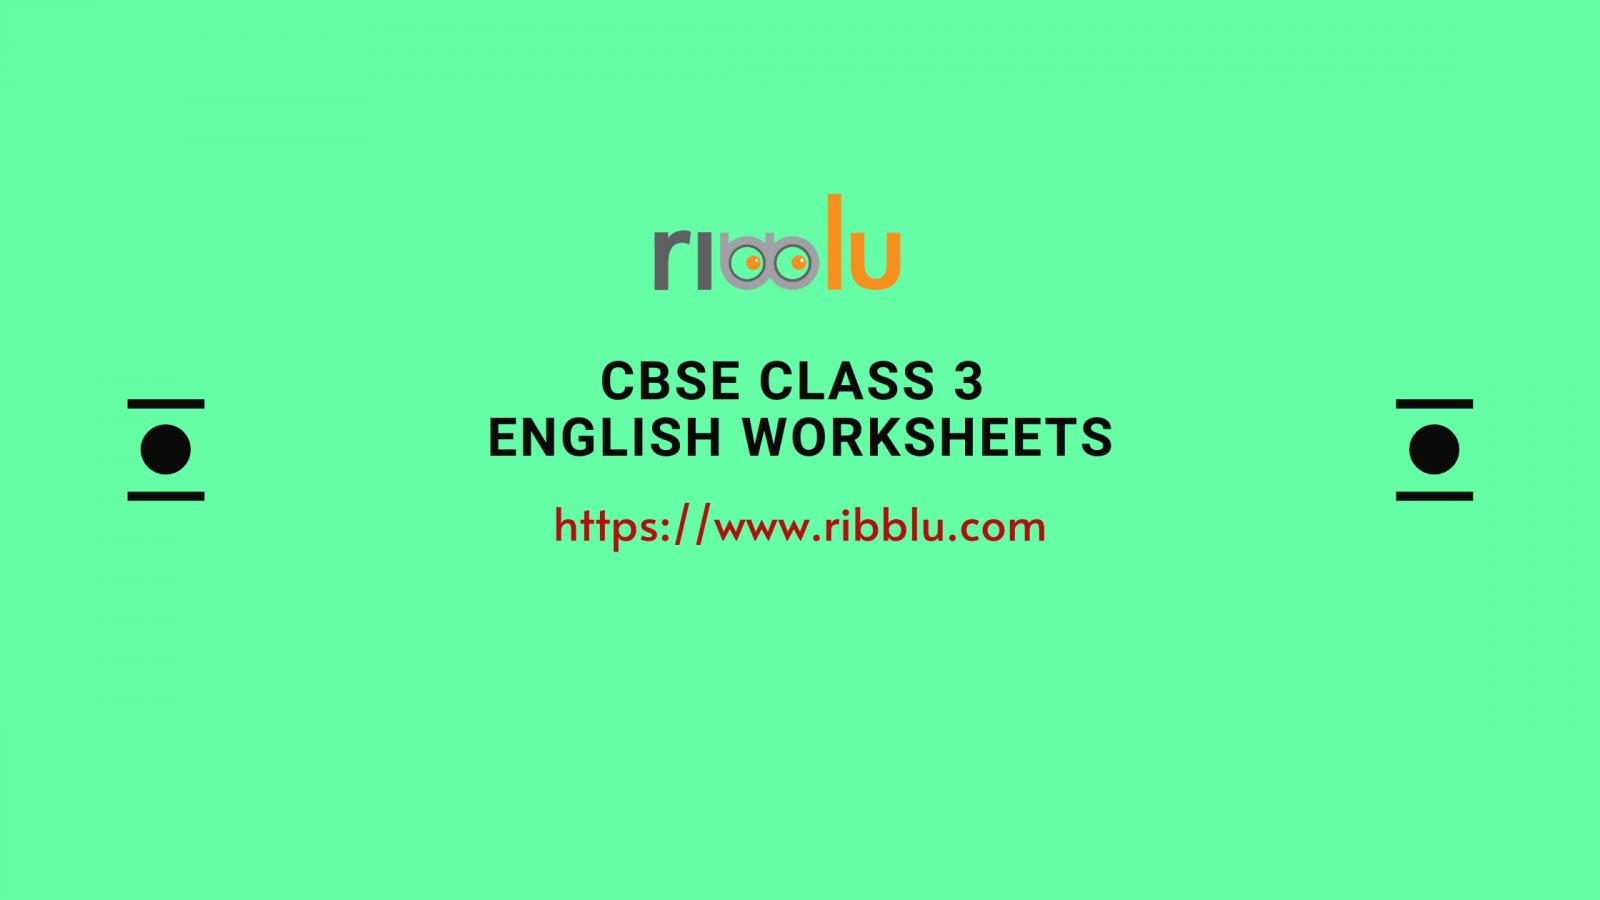 CBSE Class 3 english Worksheets